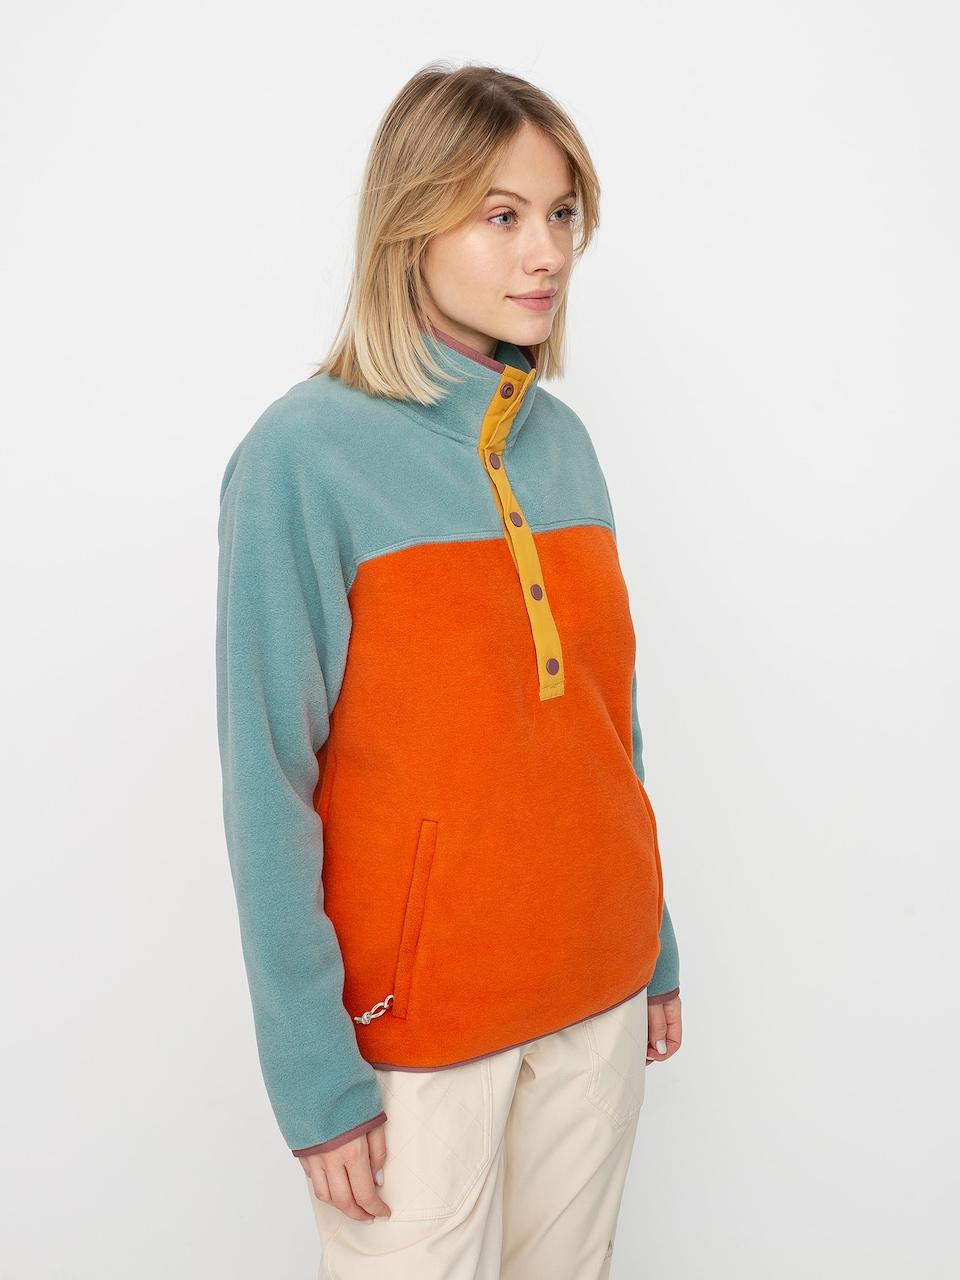 Trellis//Burnt Ochre L Burton Womens Hearth Tech Fleece